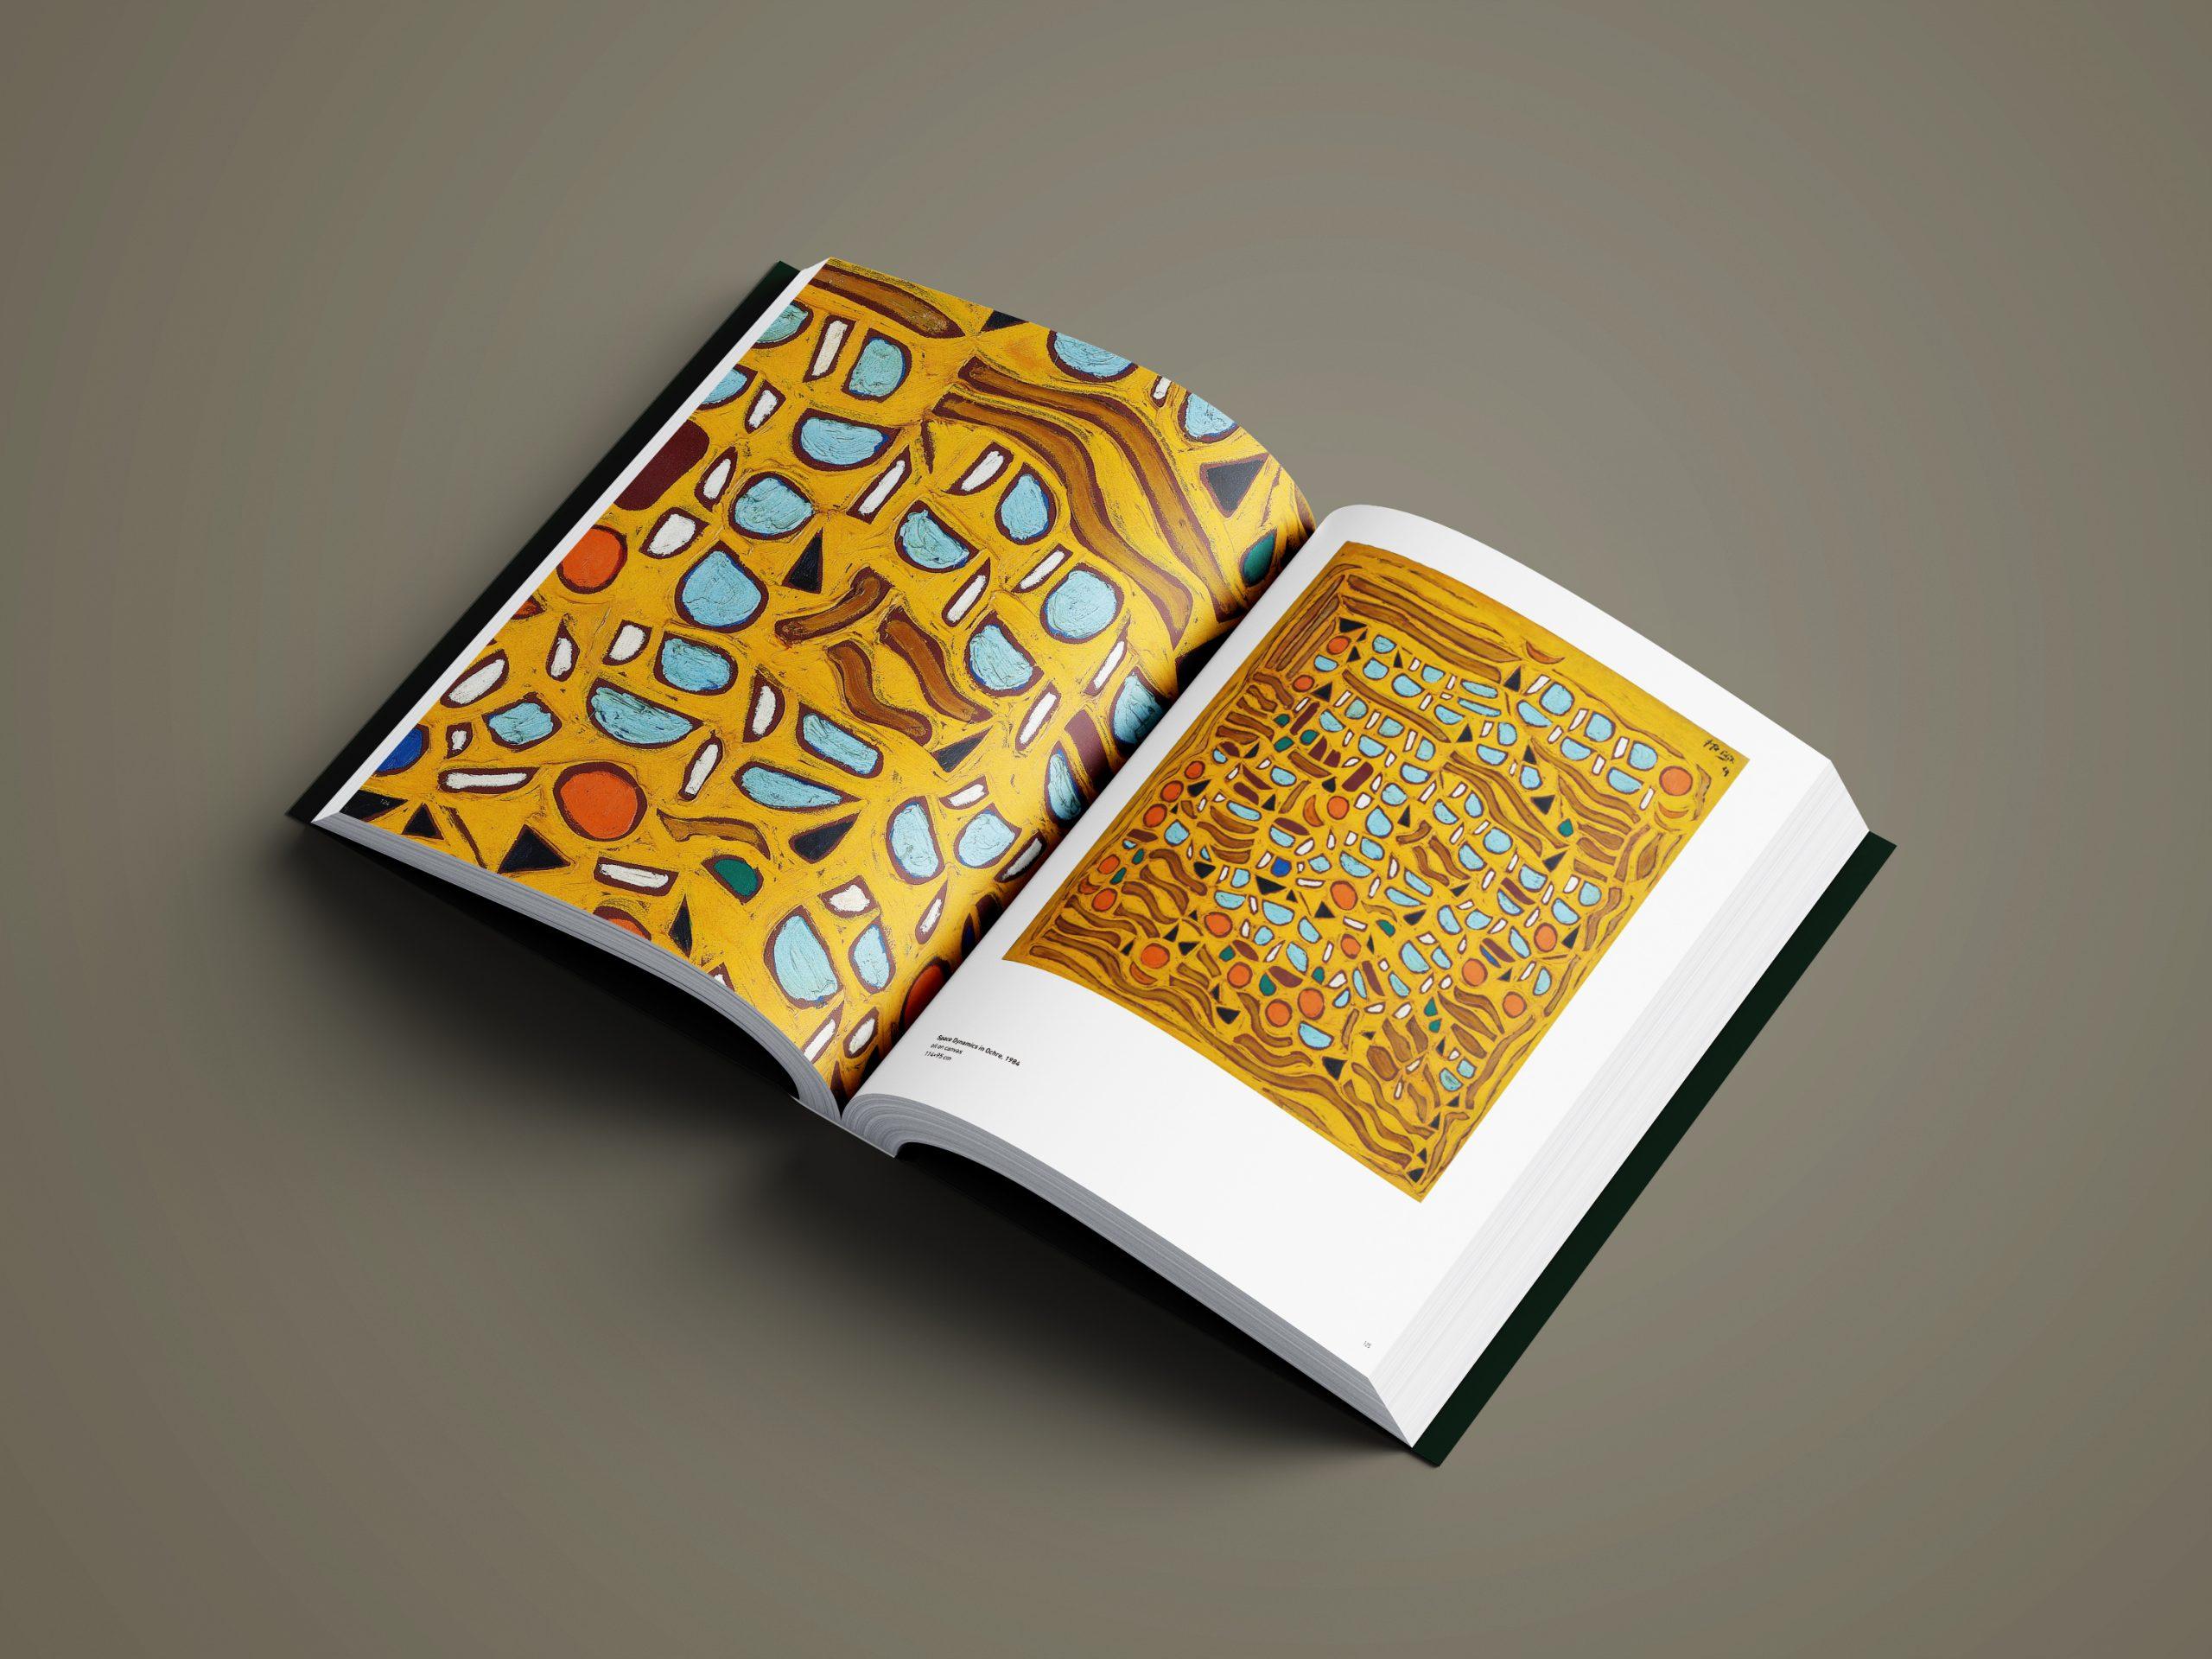 Fadjar Sidik: Expressive Design